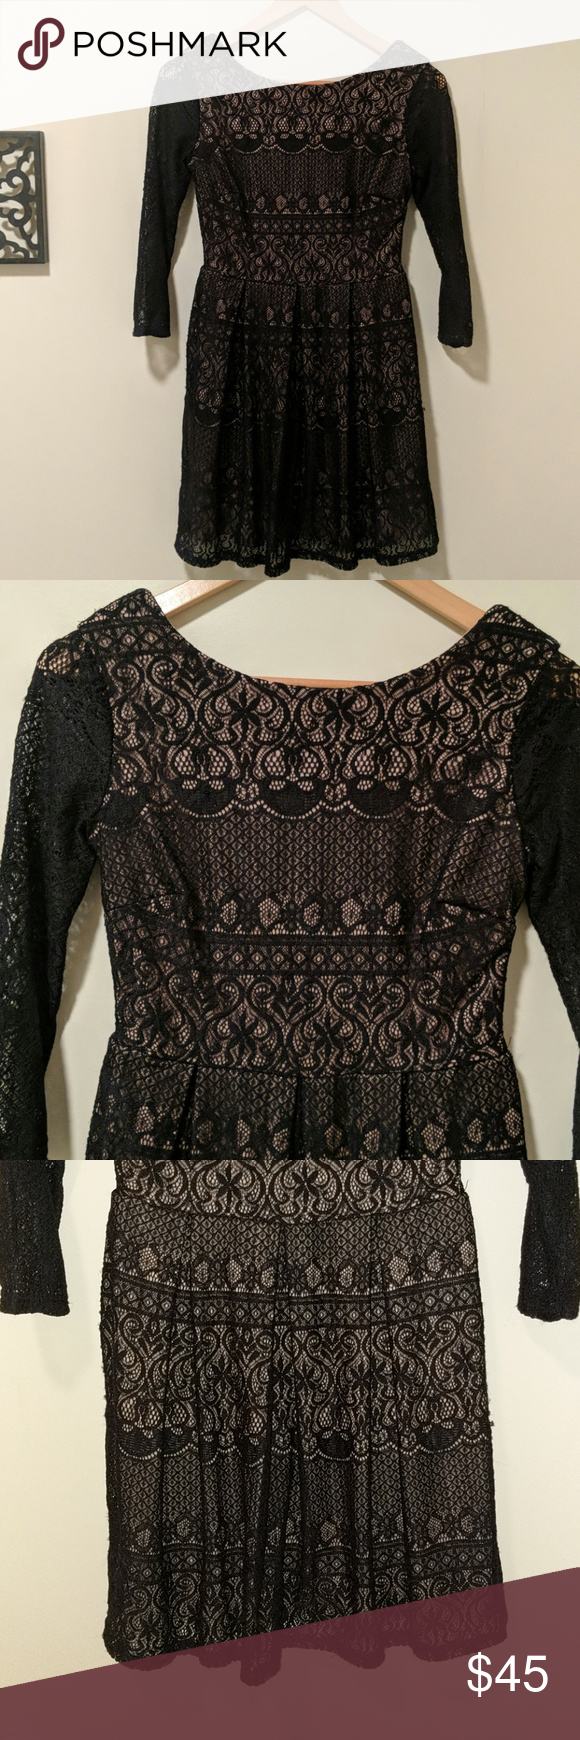 B darlin black lace dress  B darlin dress  My Posh Picks  Pinterest  Taupe colour Taupe and Fe